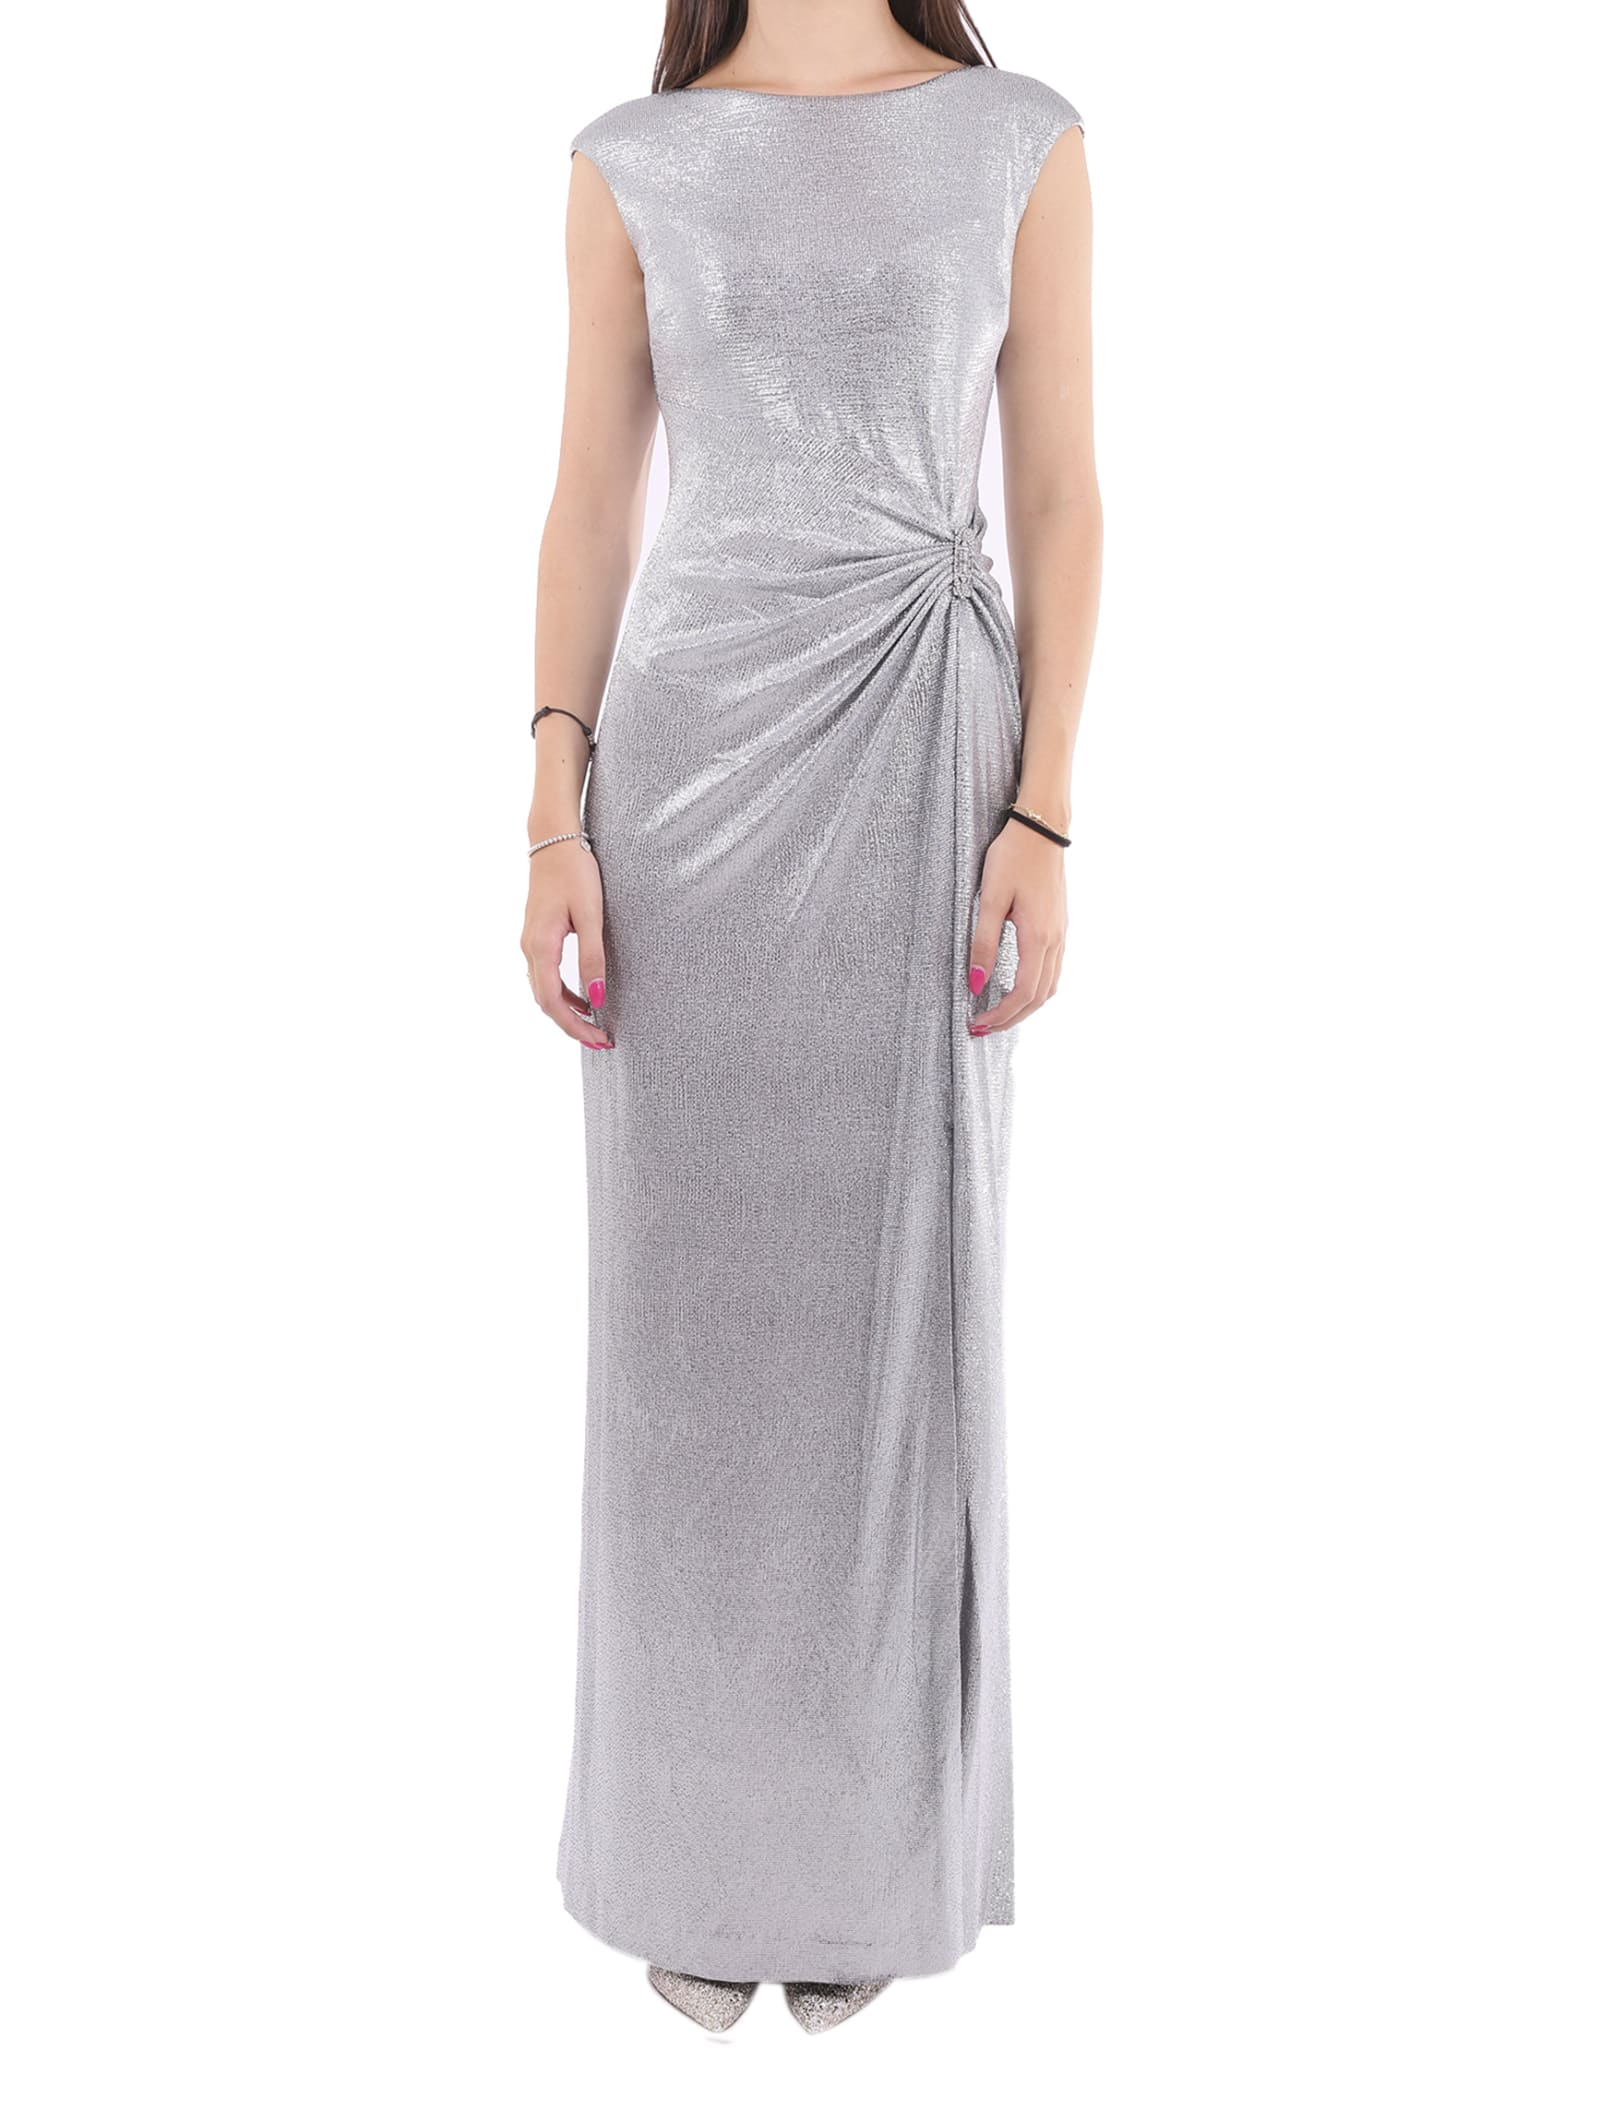 Lauren Ralph Lauren Silver Ilianne Dress